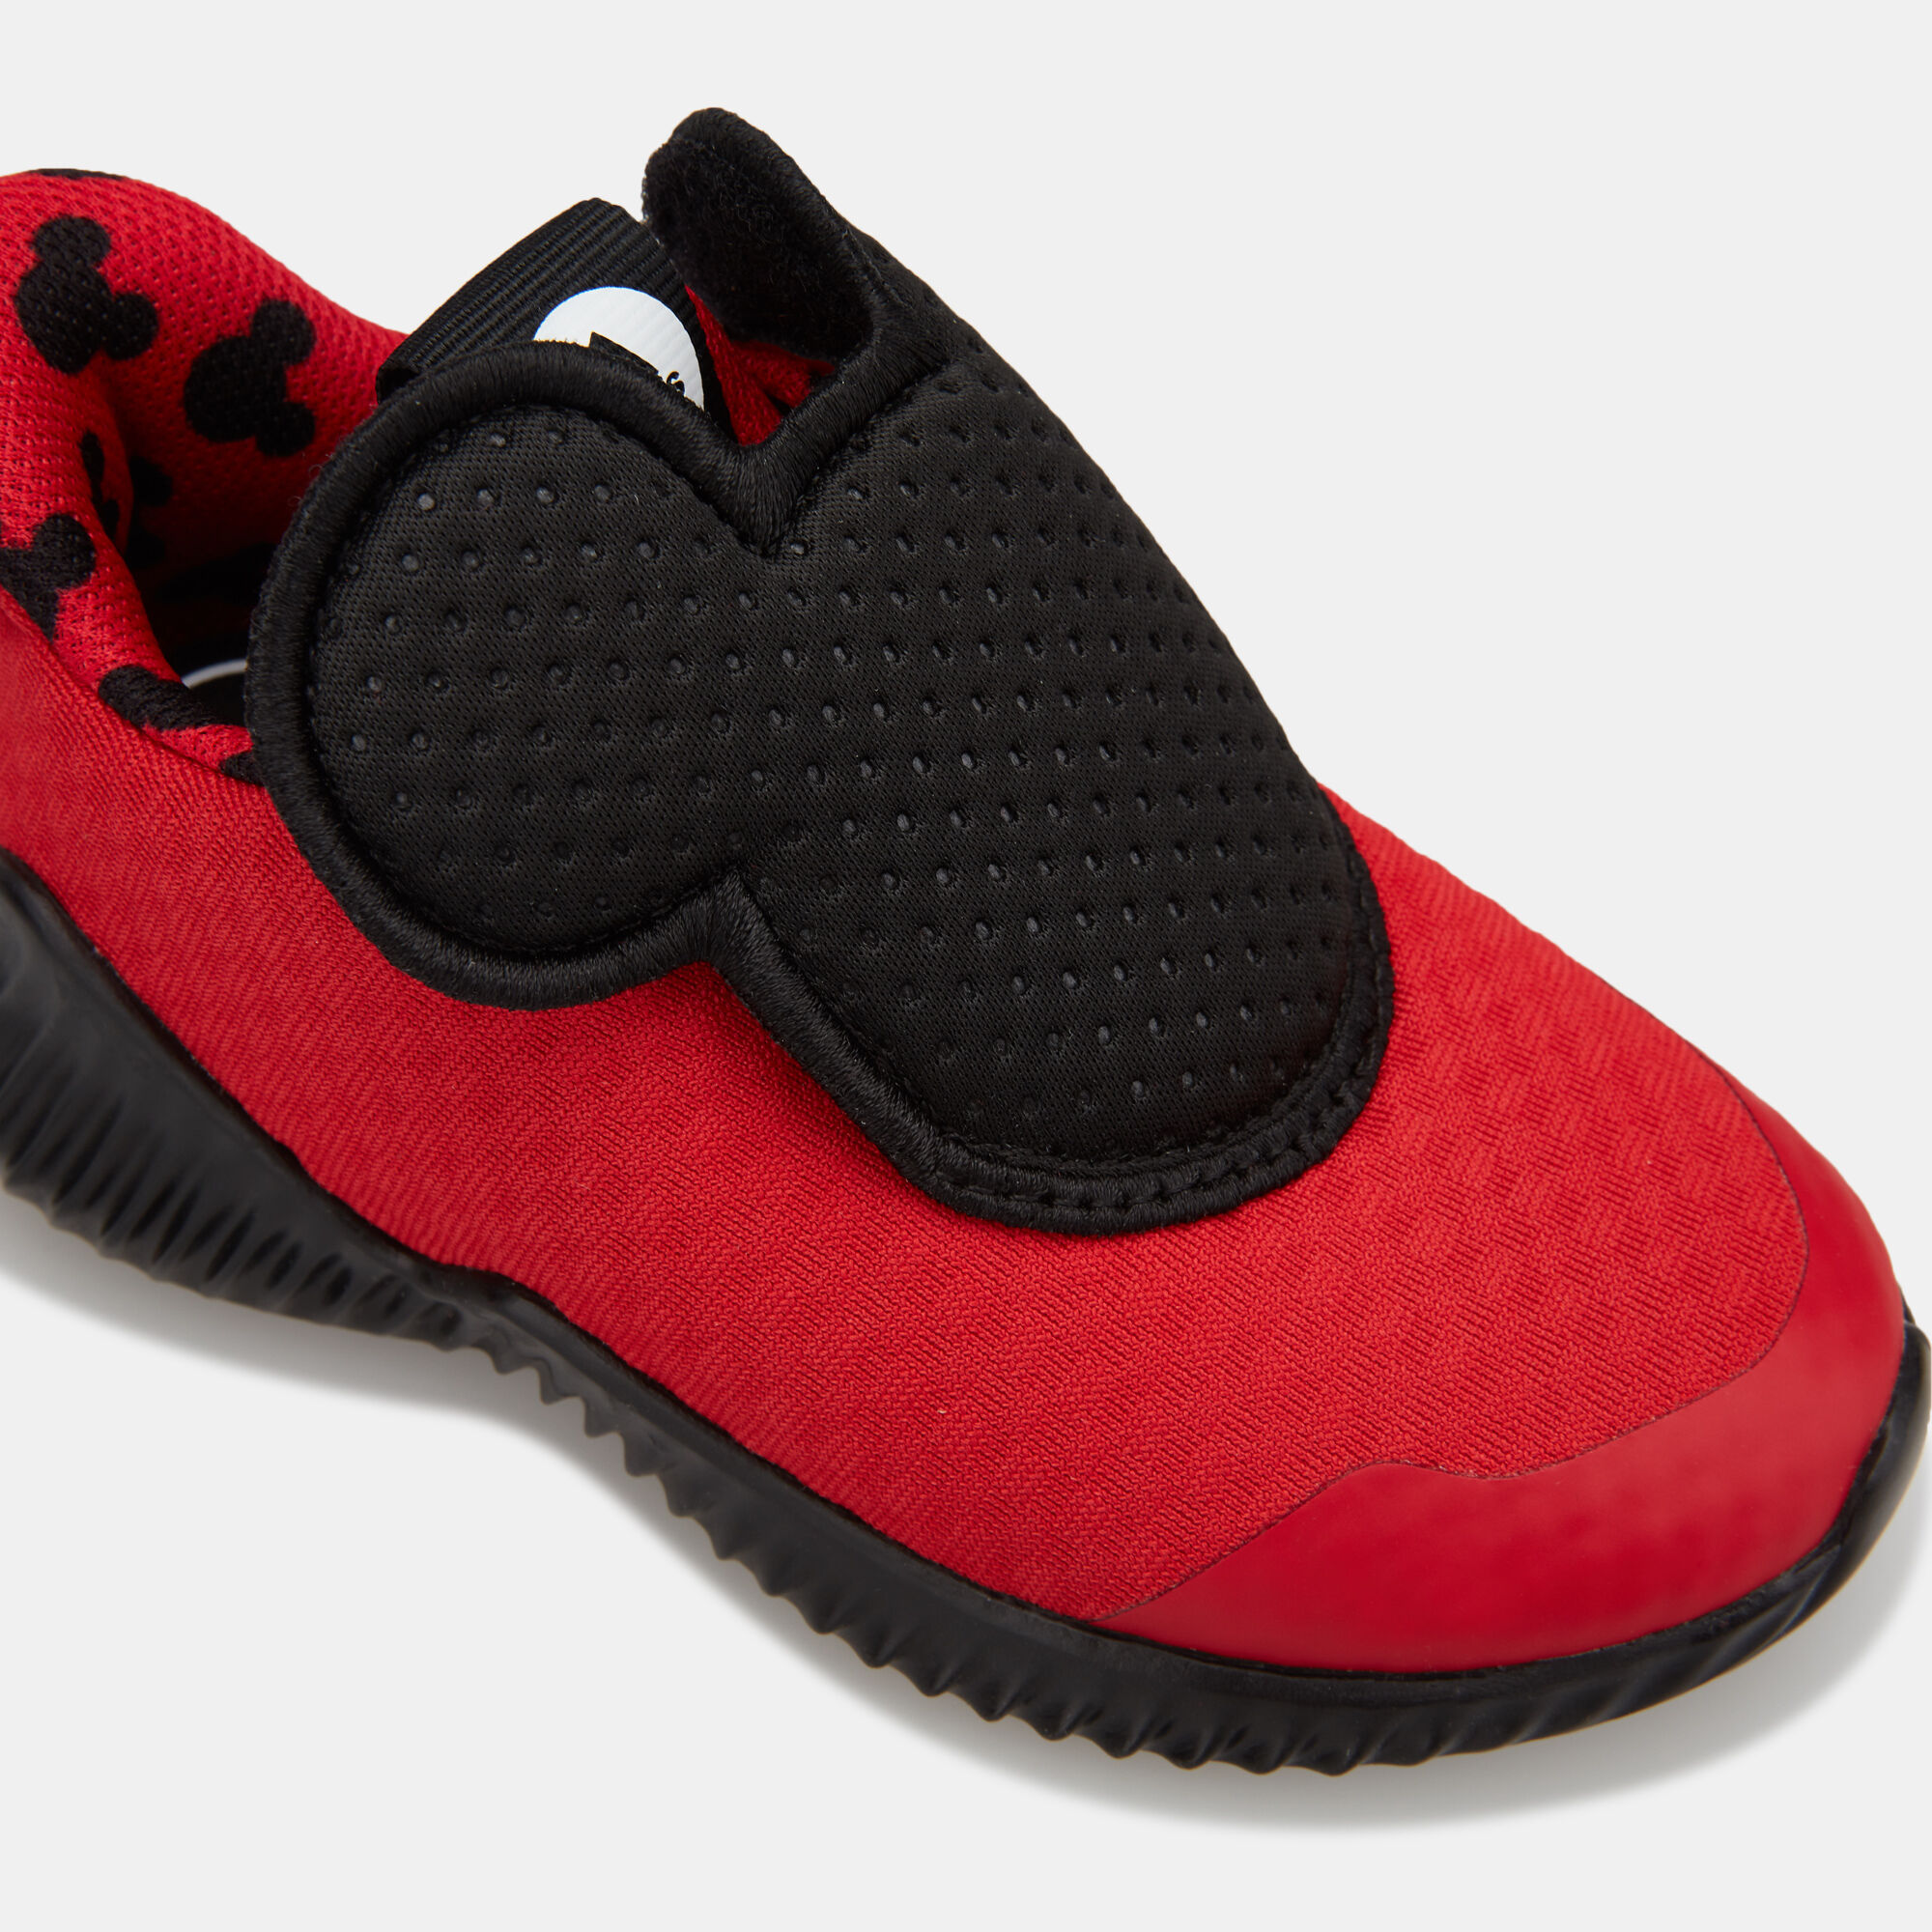 Buy adidas Kids' FortaRun Mickey Mouse